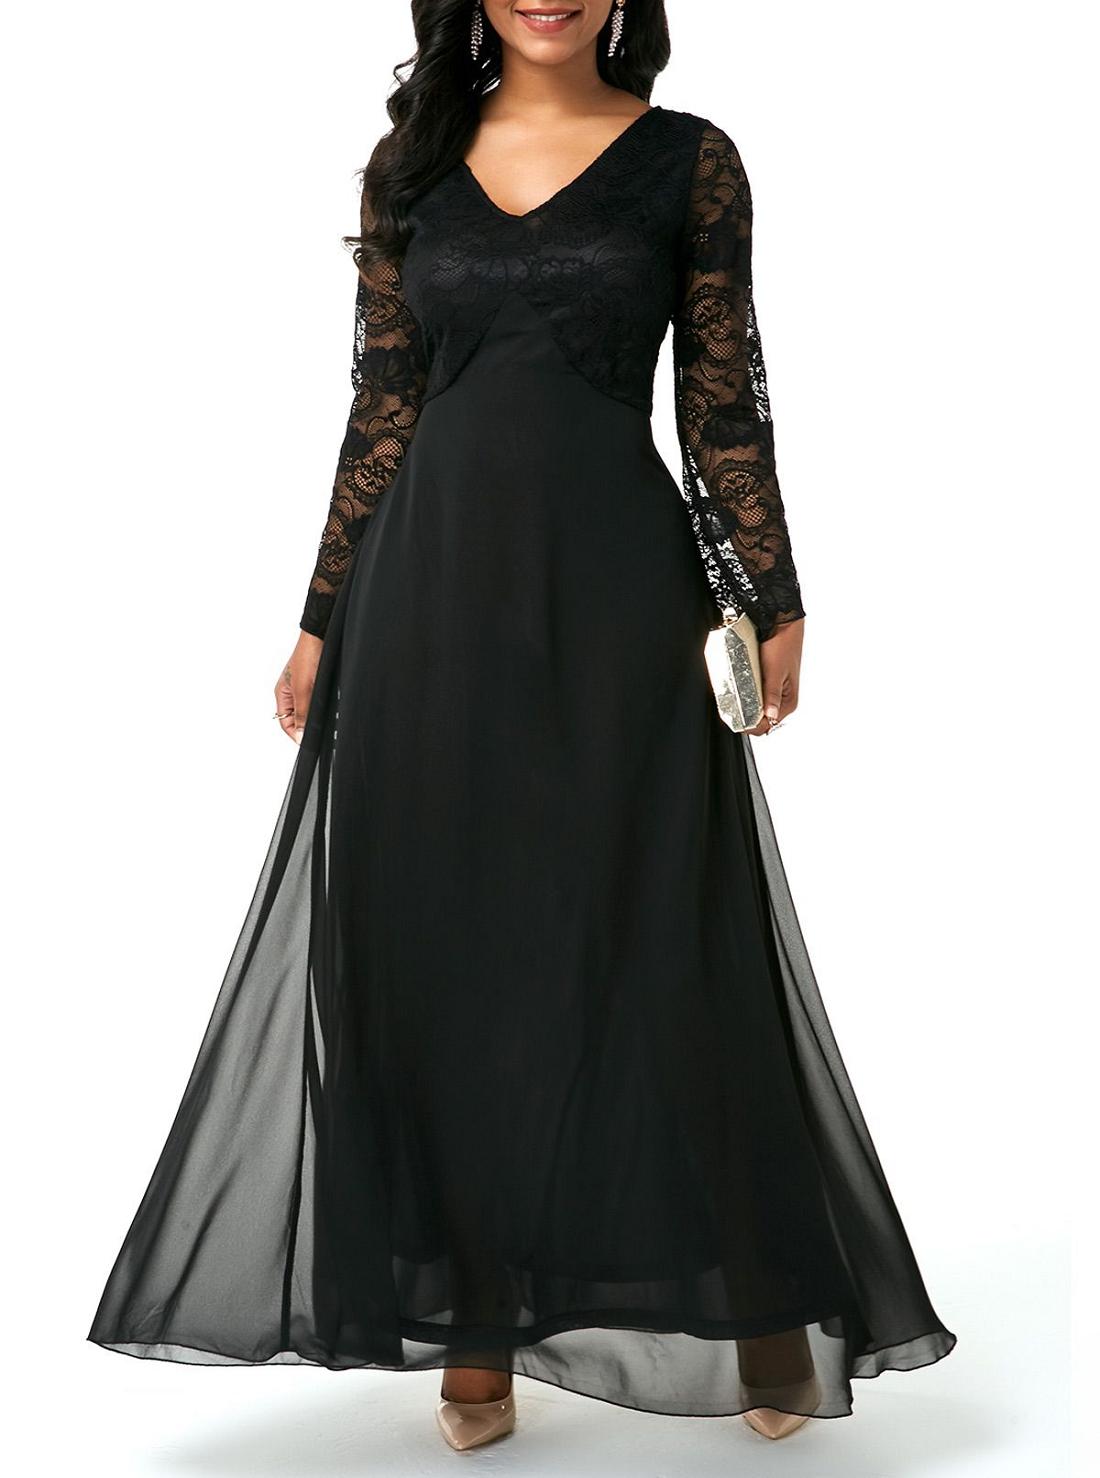 2 Wholesale Chiffon Long Sleeve Dresses